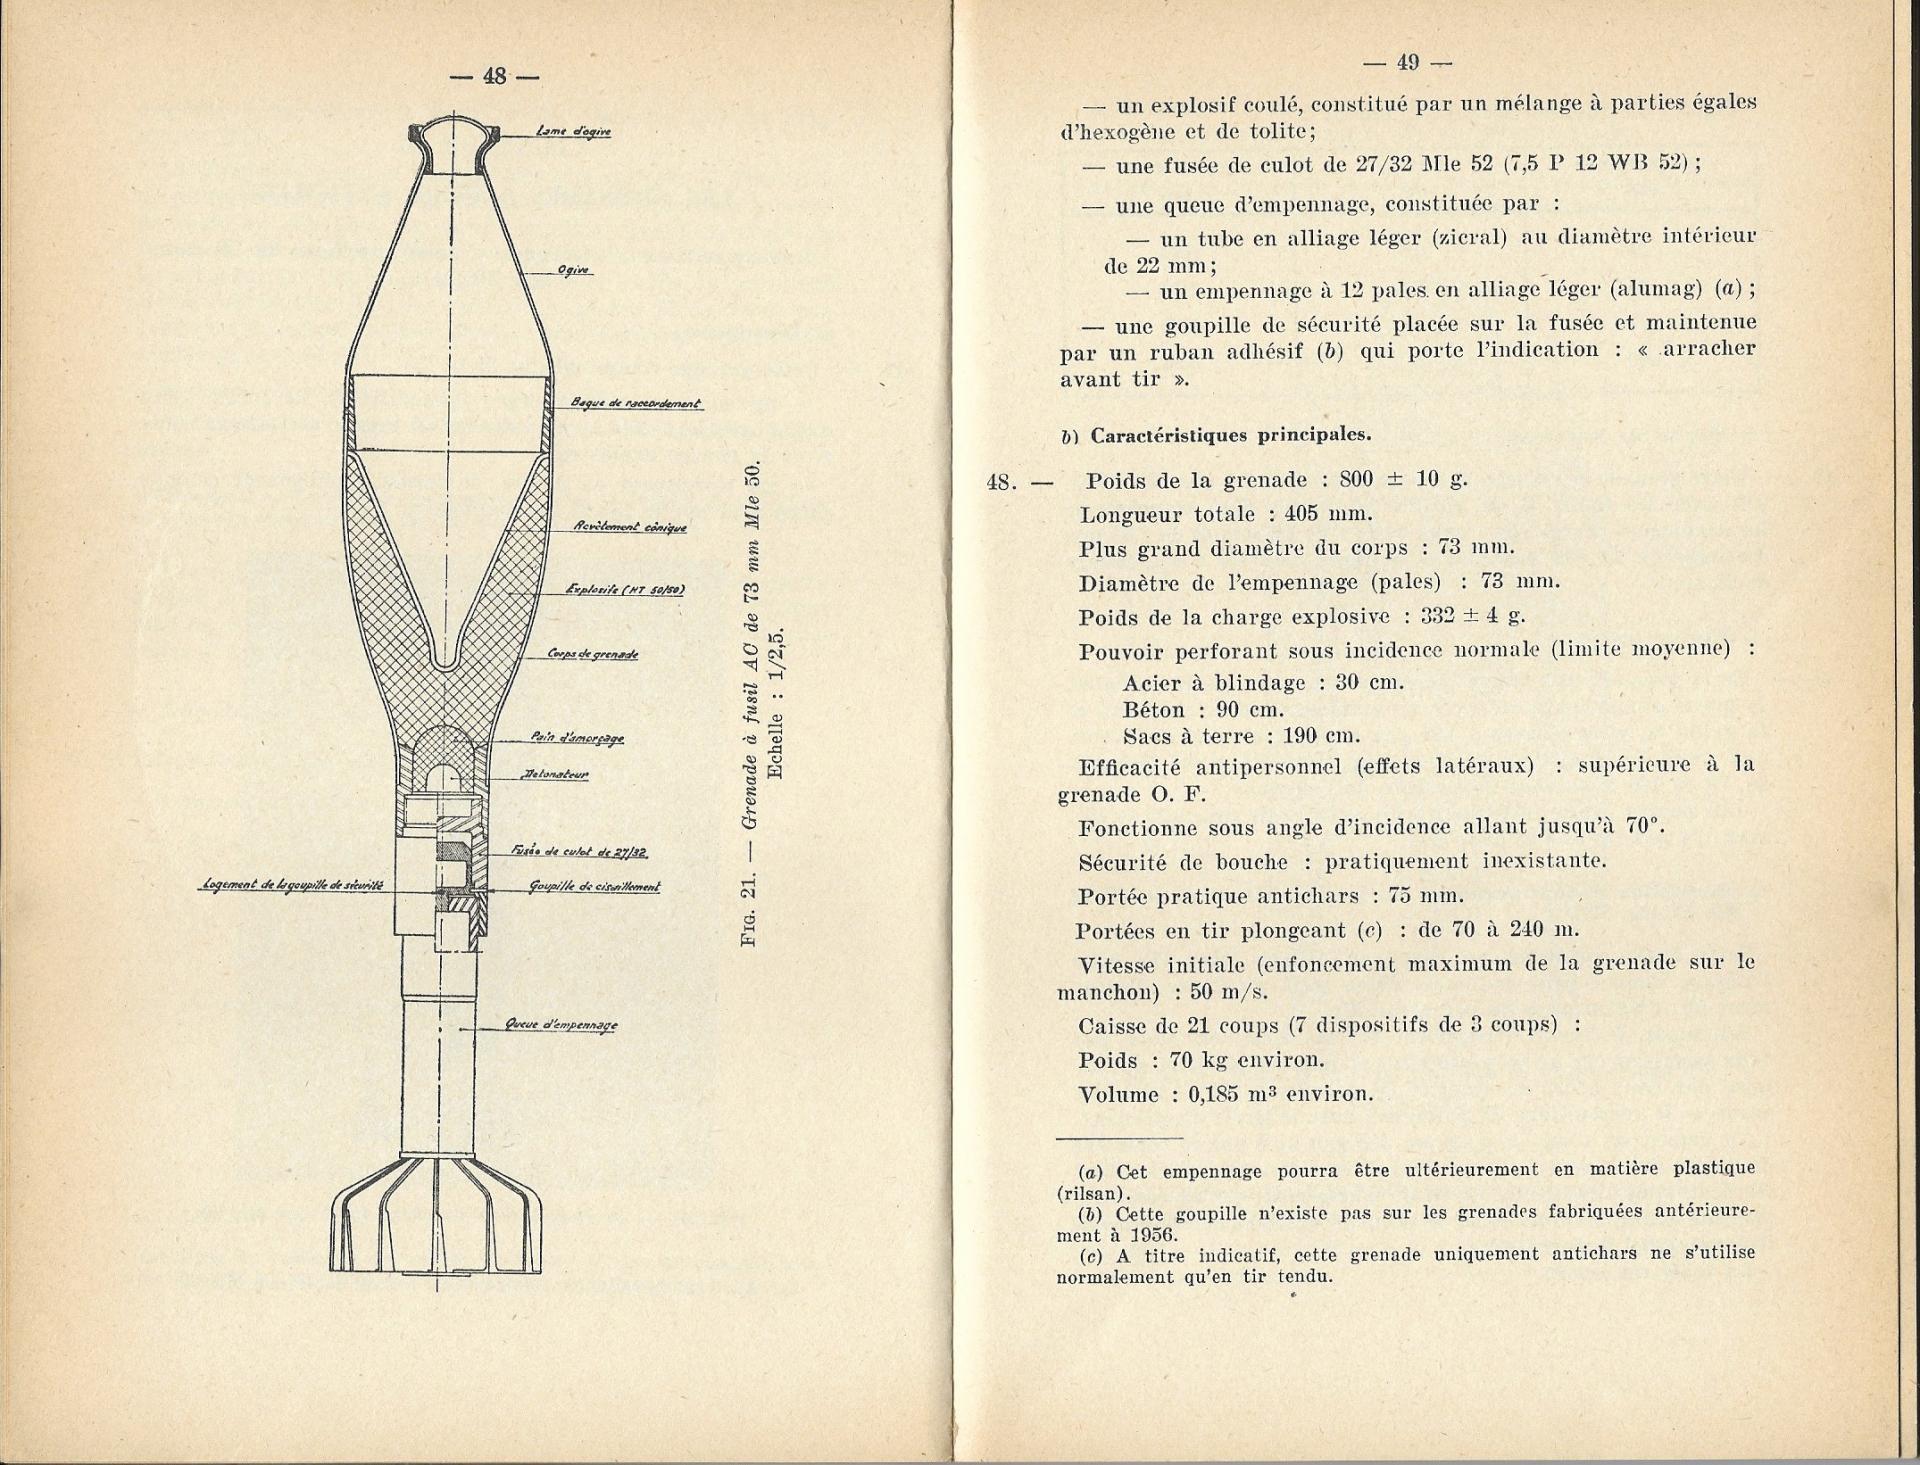 Grenades a fusil 1957 p48 49